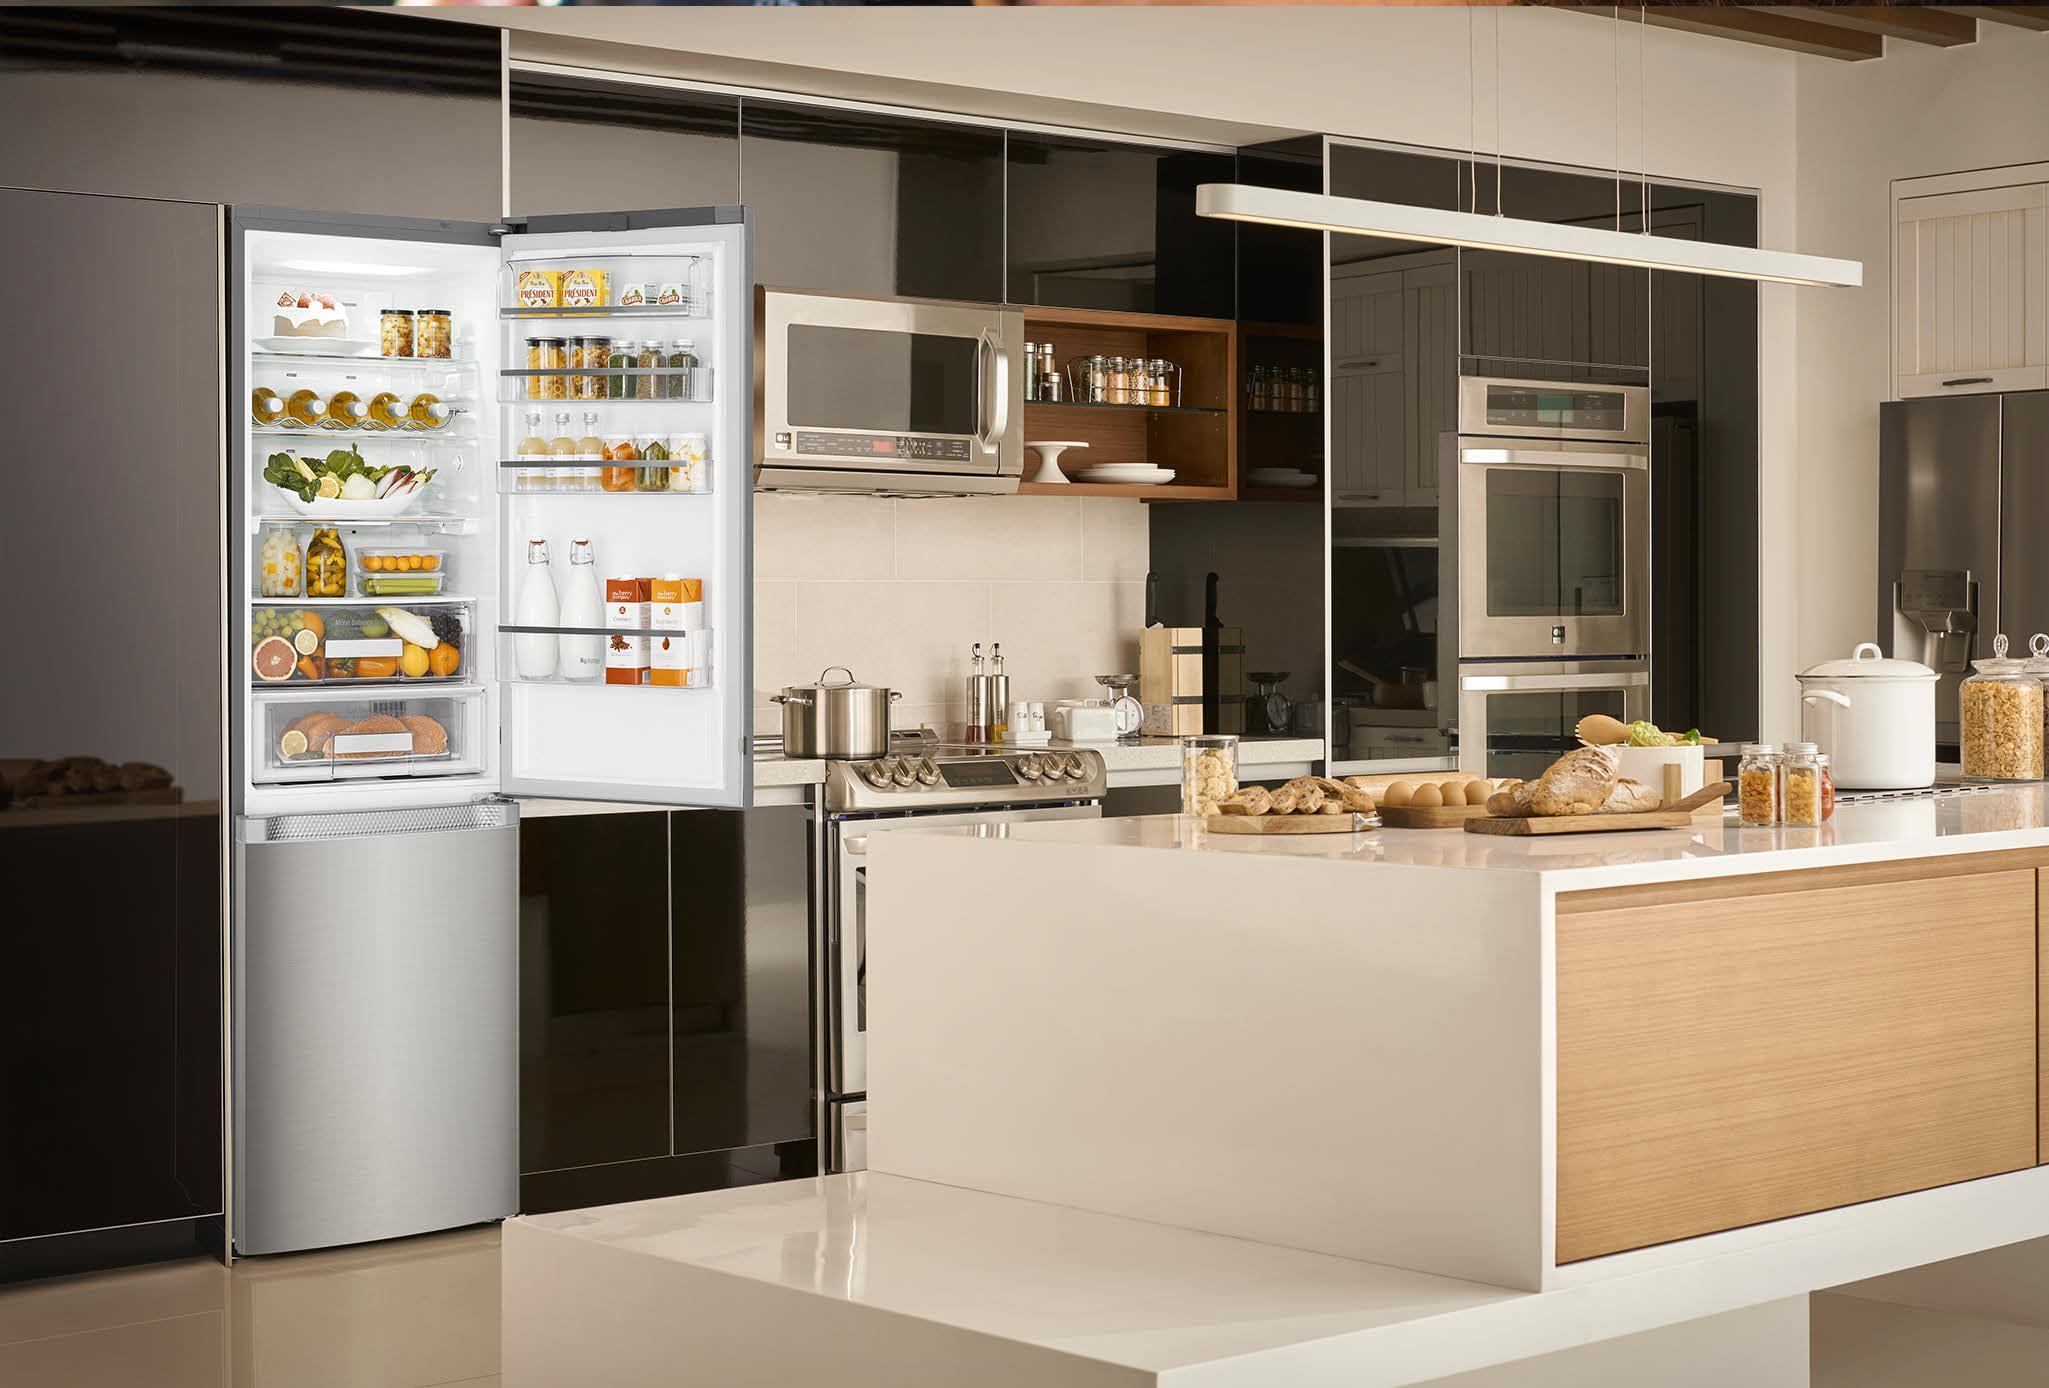 cucine moderne con frigo esterno bj89 regardsdefemmes. Black Bedroom Furniture Sets. Home Design Ideas